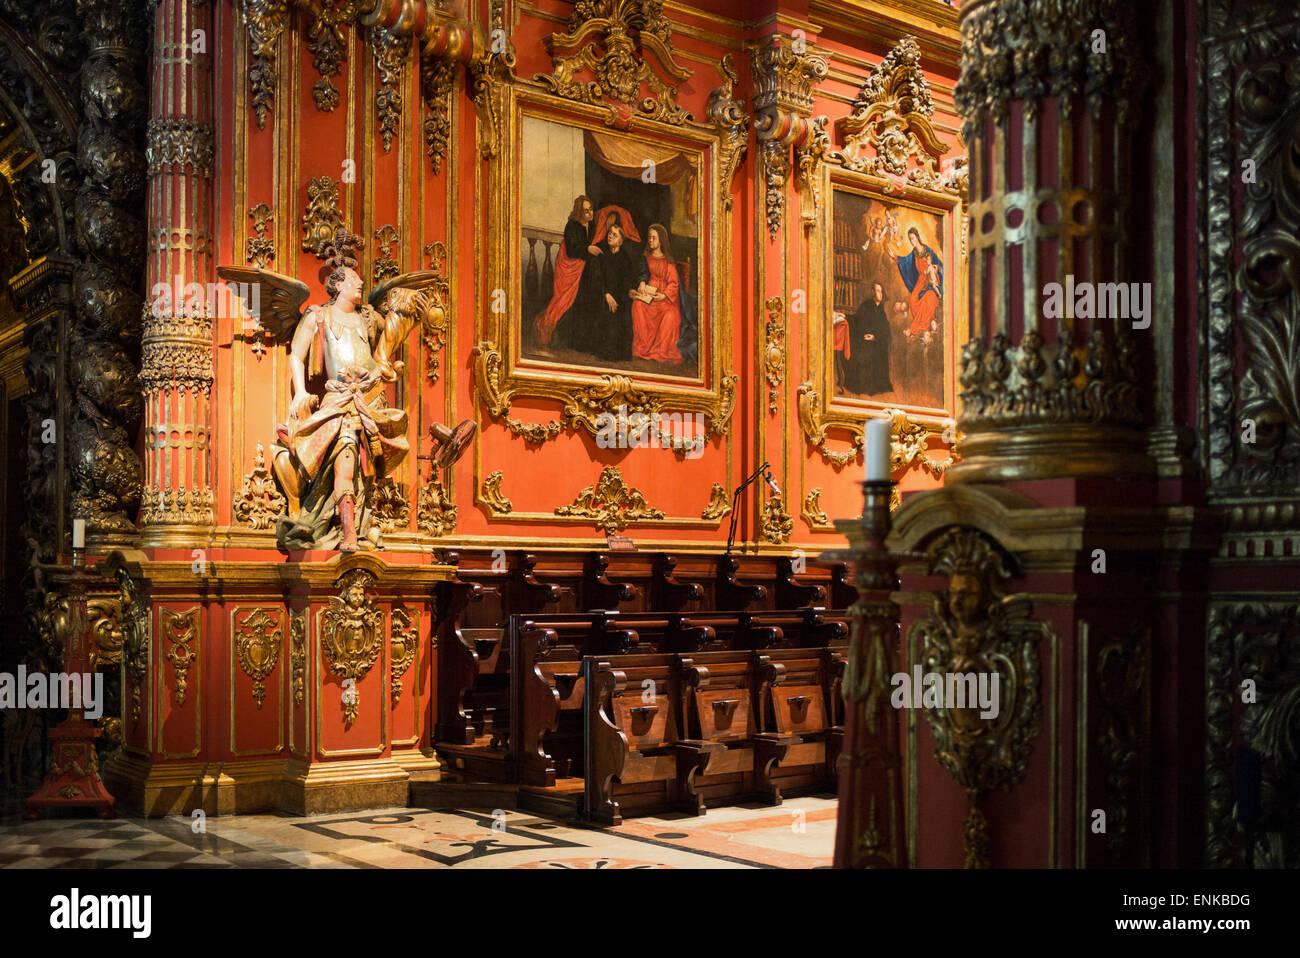 Brasil, Rio de Janeiro, vista del interior del San Benito (Sao Bento) monasterio Foto de stock